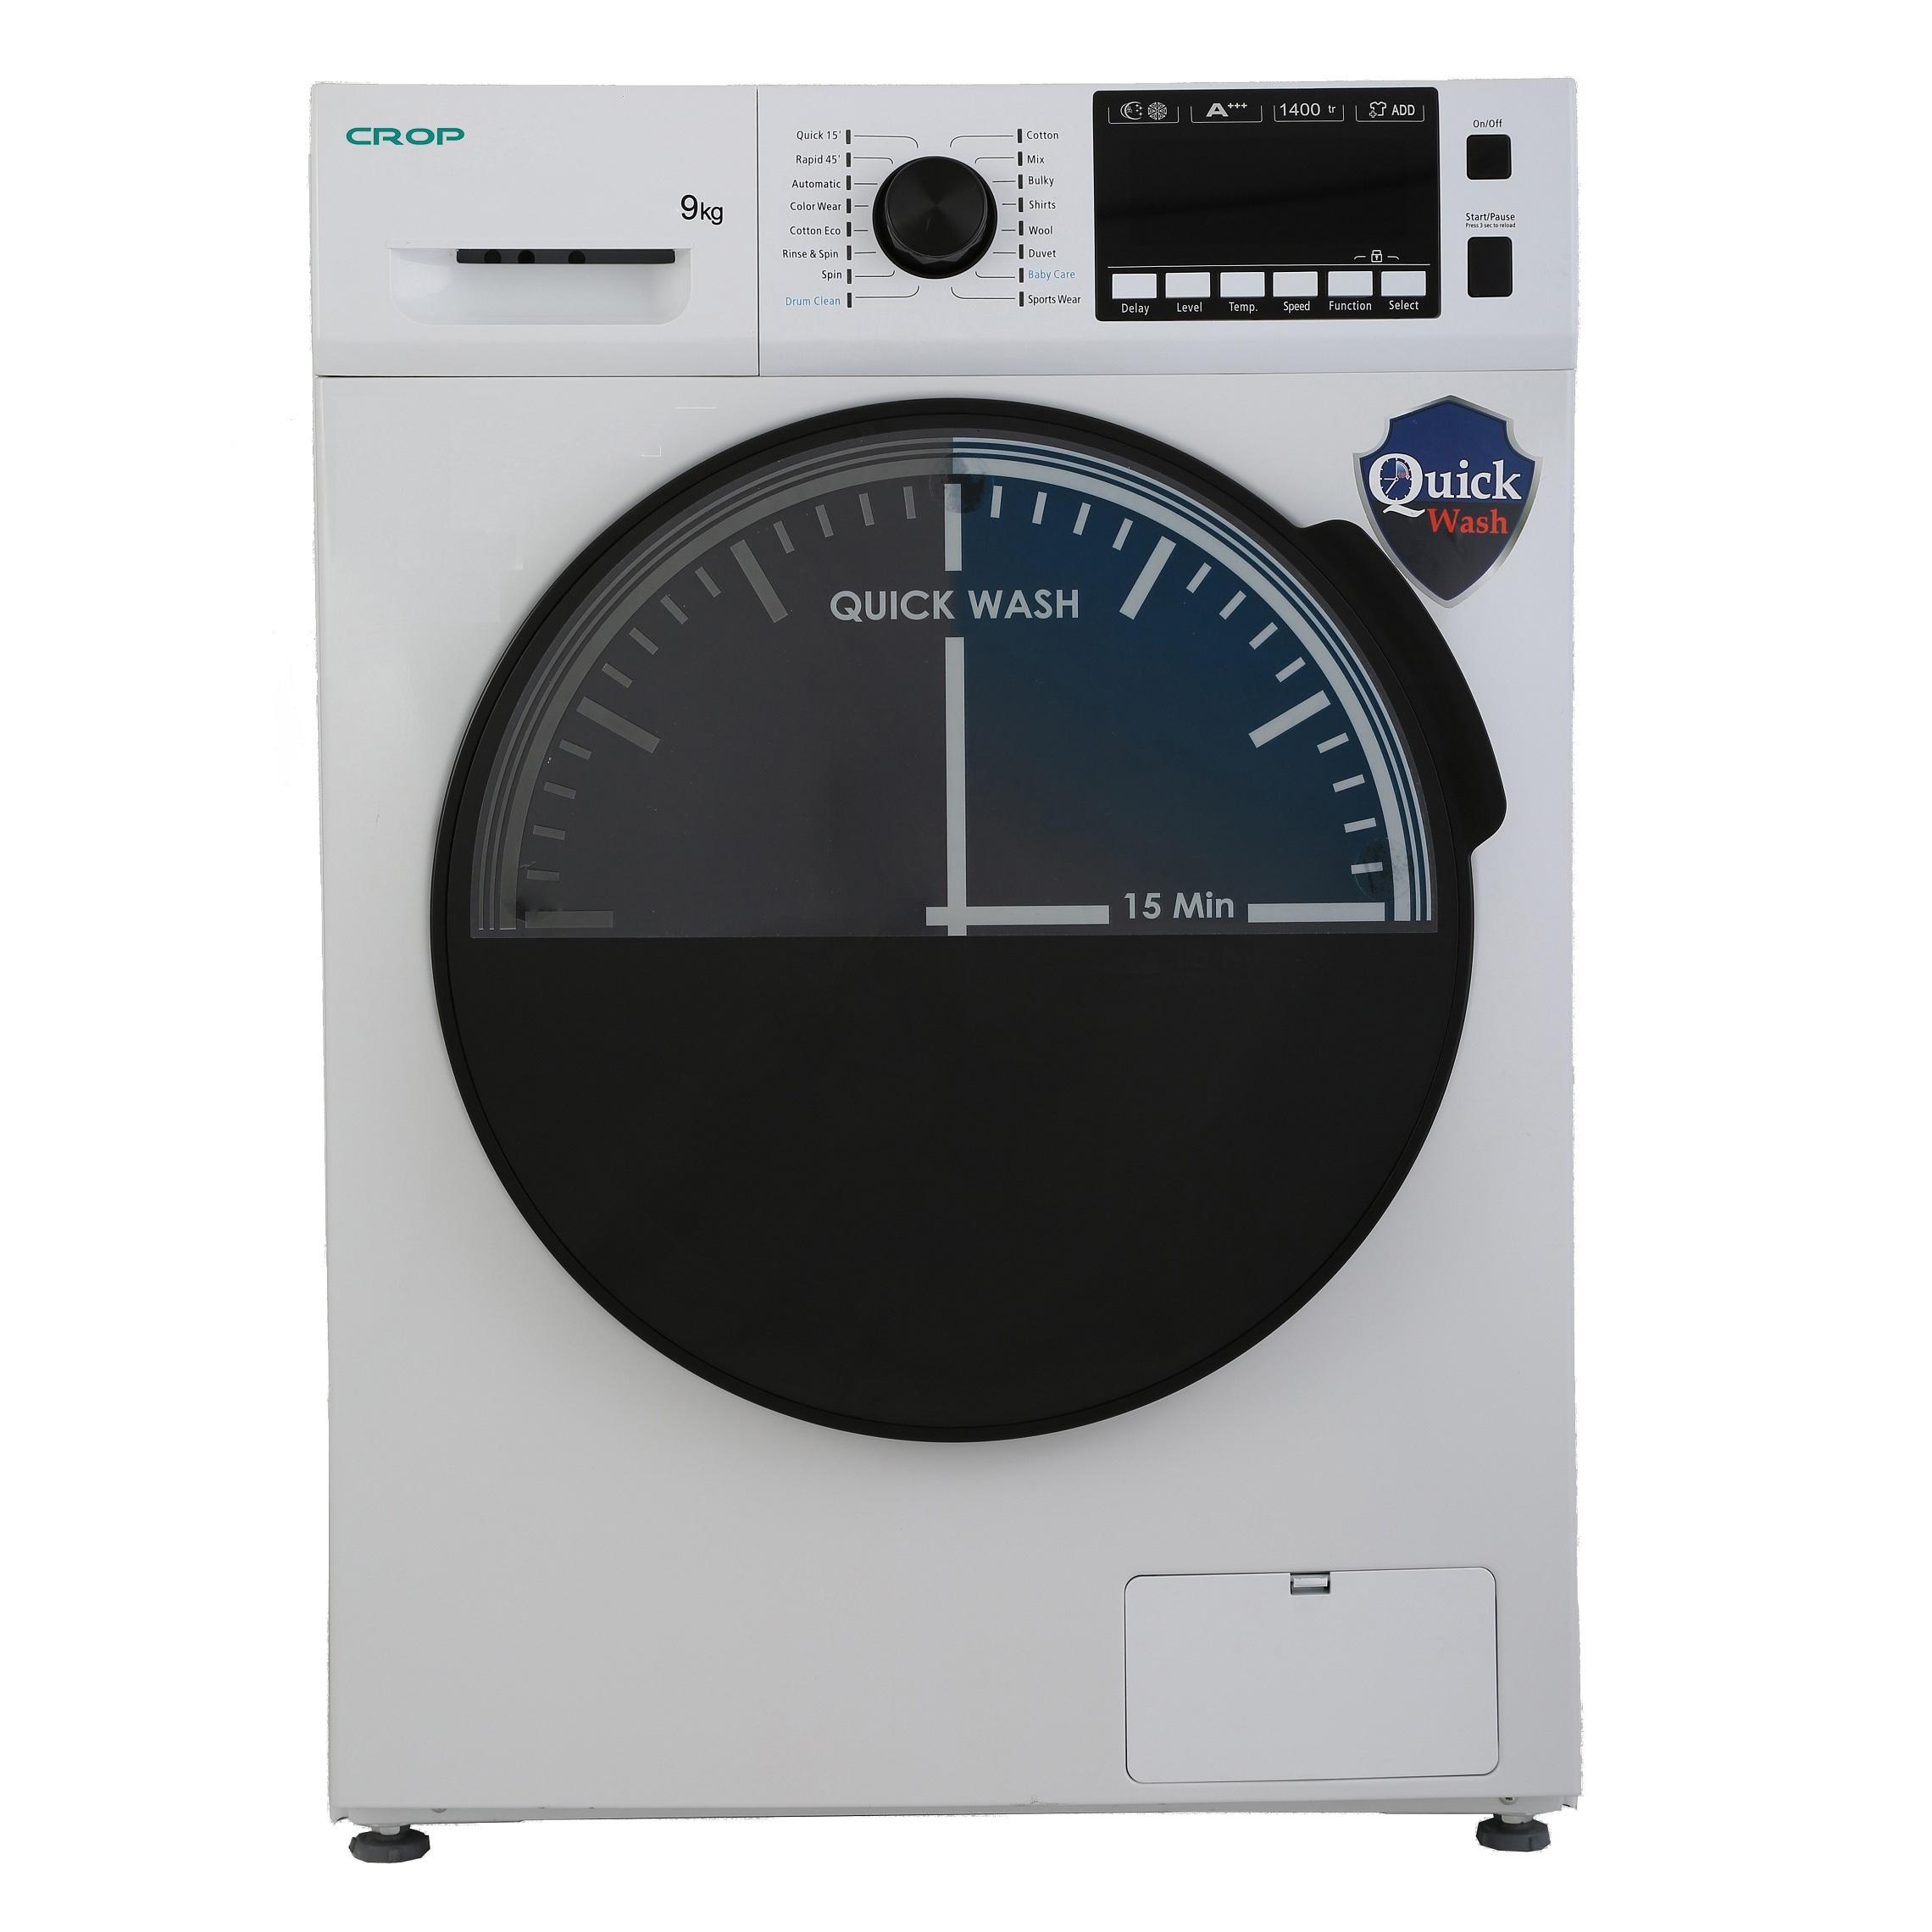 ماشین لباسشویی کروپ مدل WFT 29417 ظرفیت 9 کیلوگرم